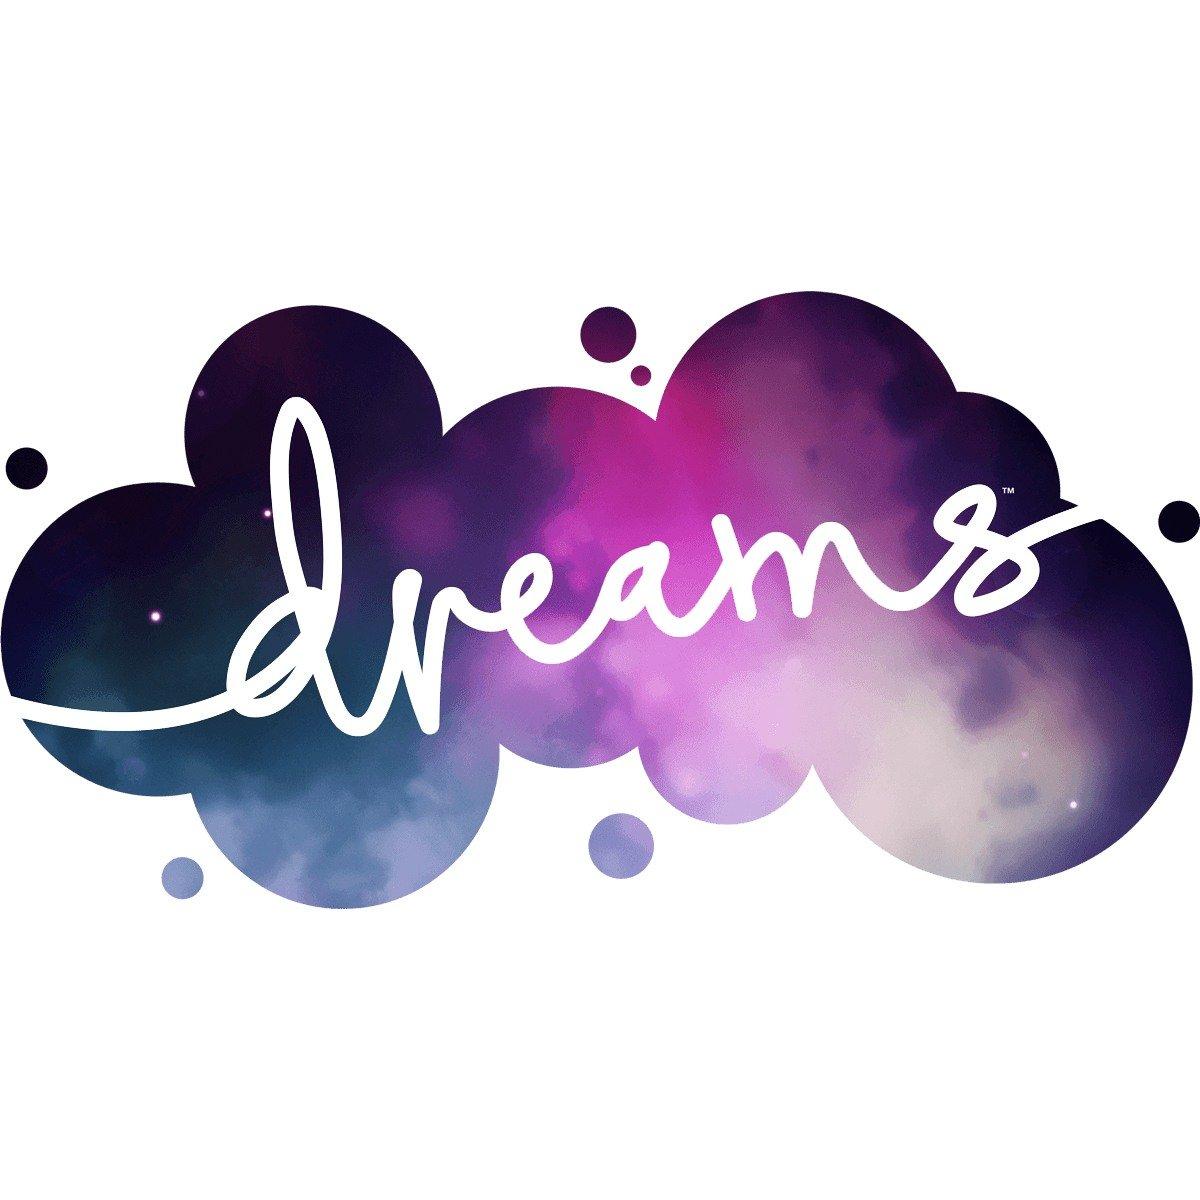 Эмблема мечта картинки